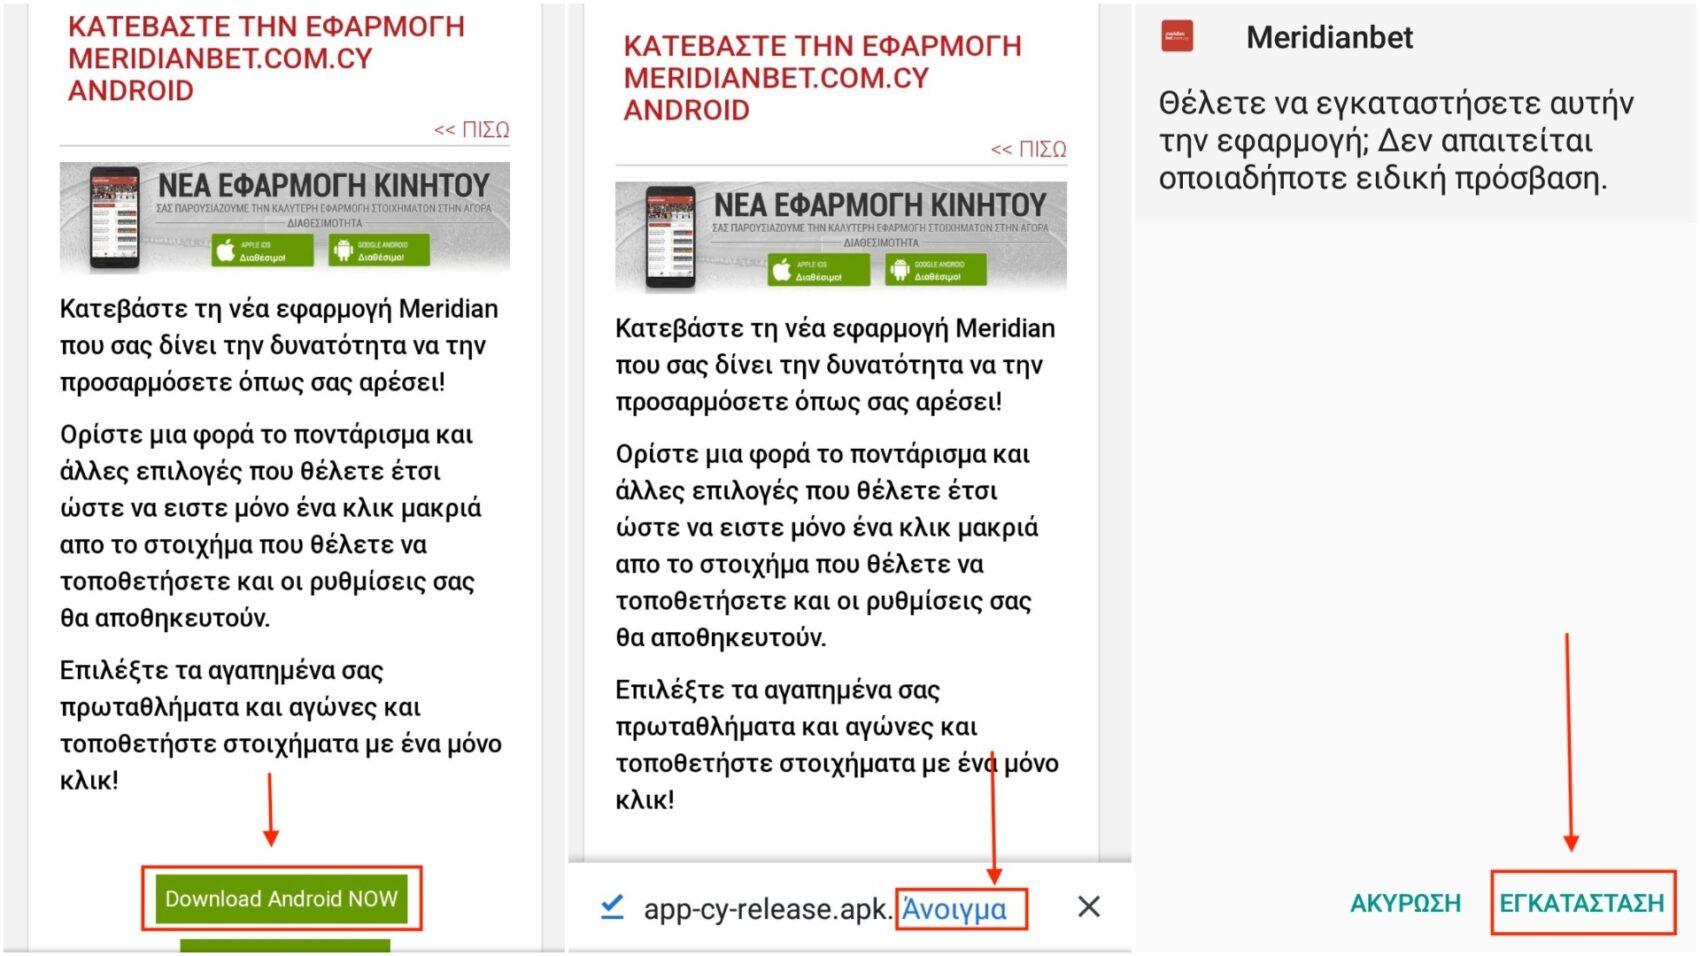 meridianbet app εφαρμογη download android ios